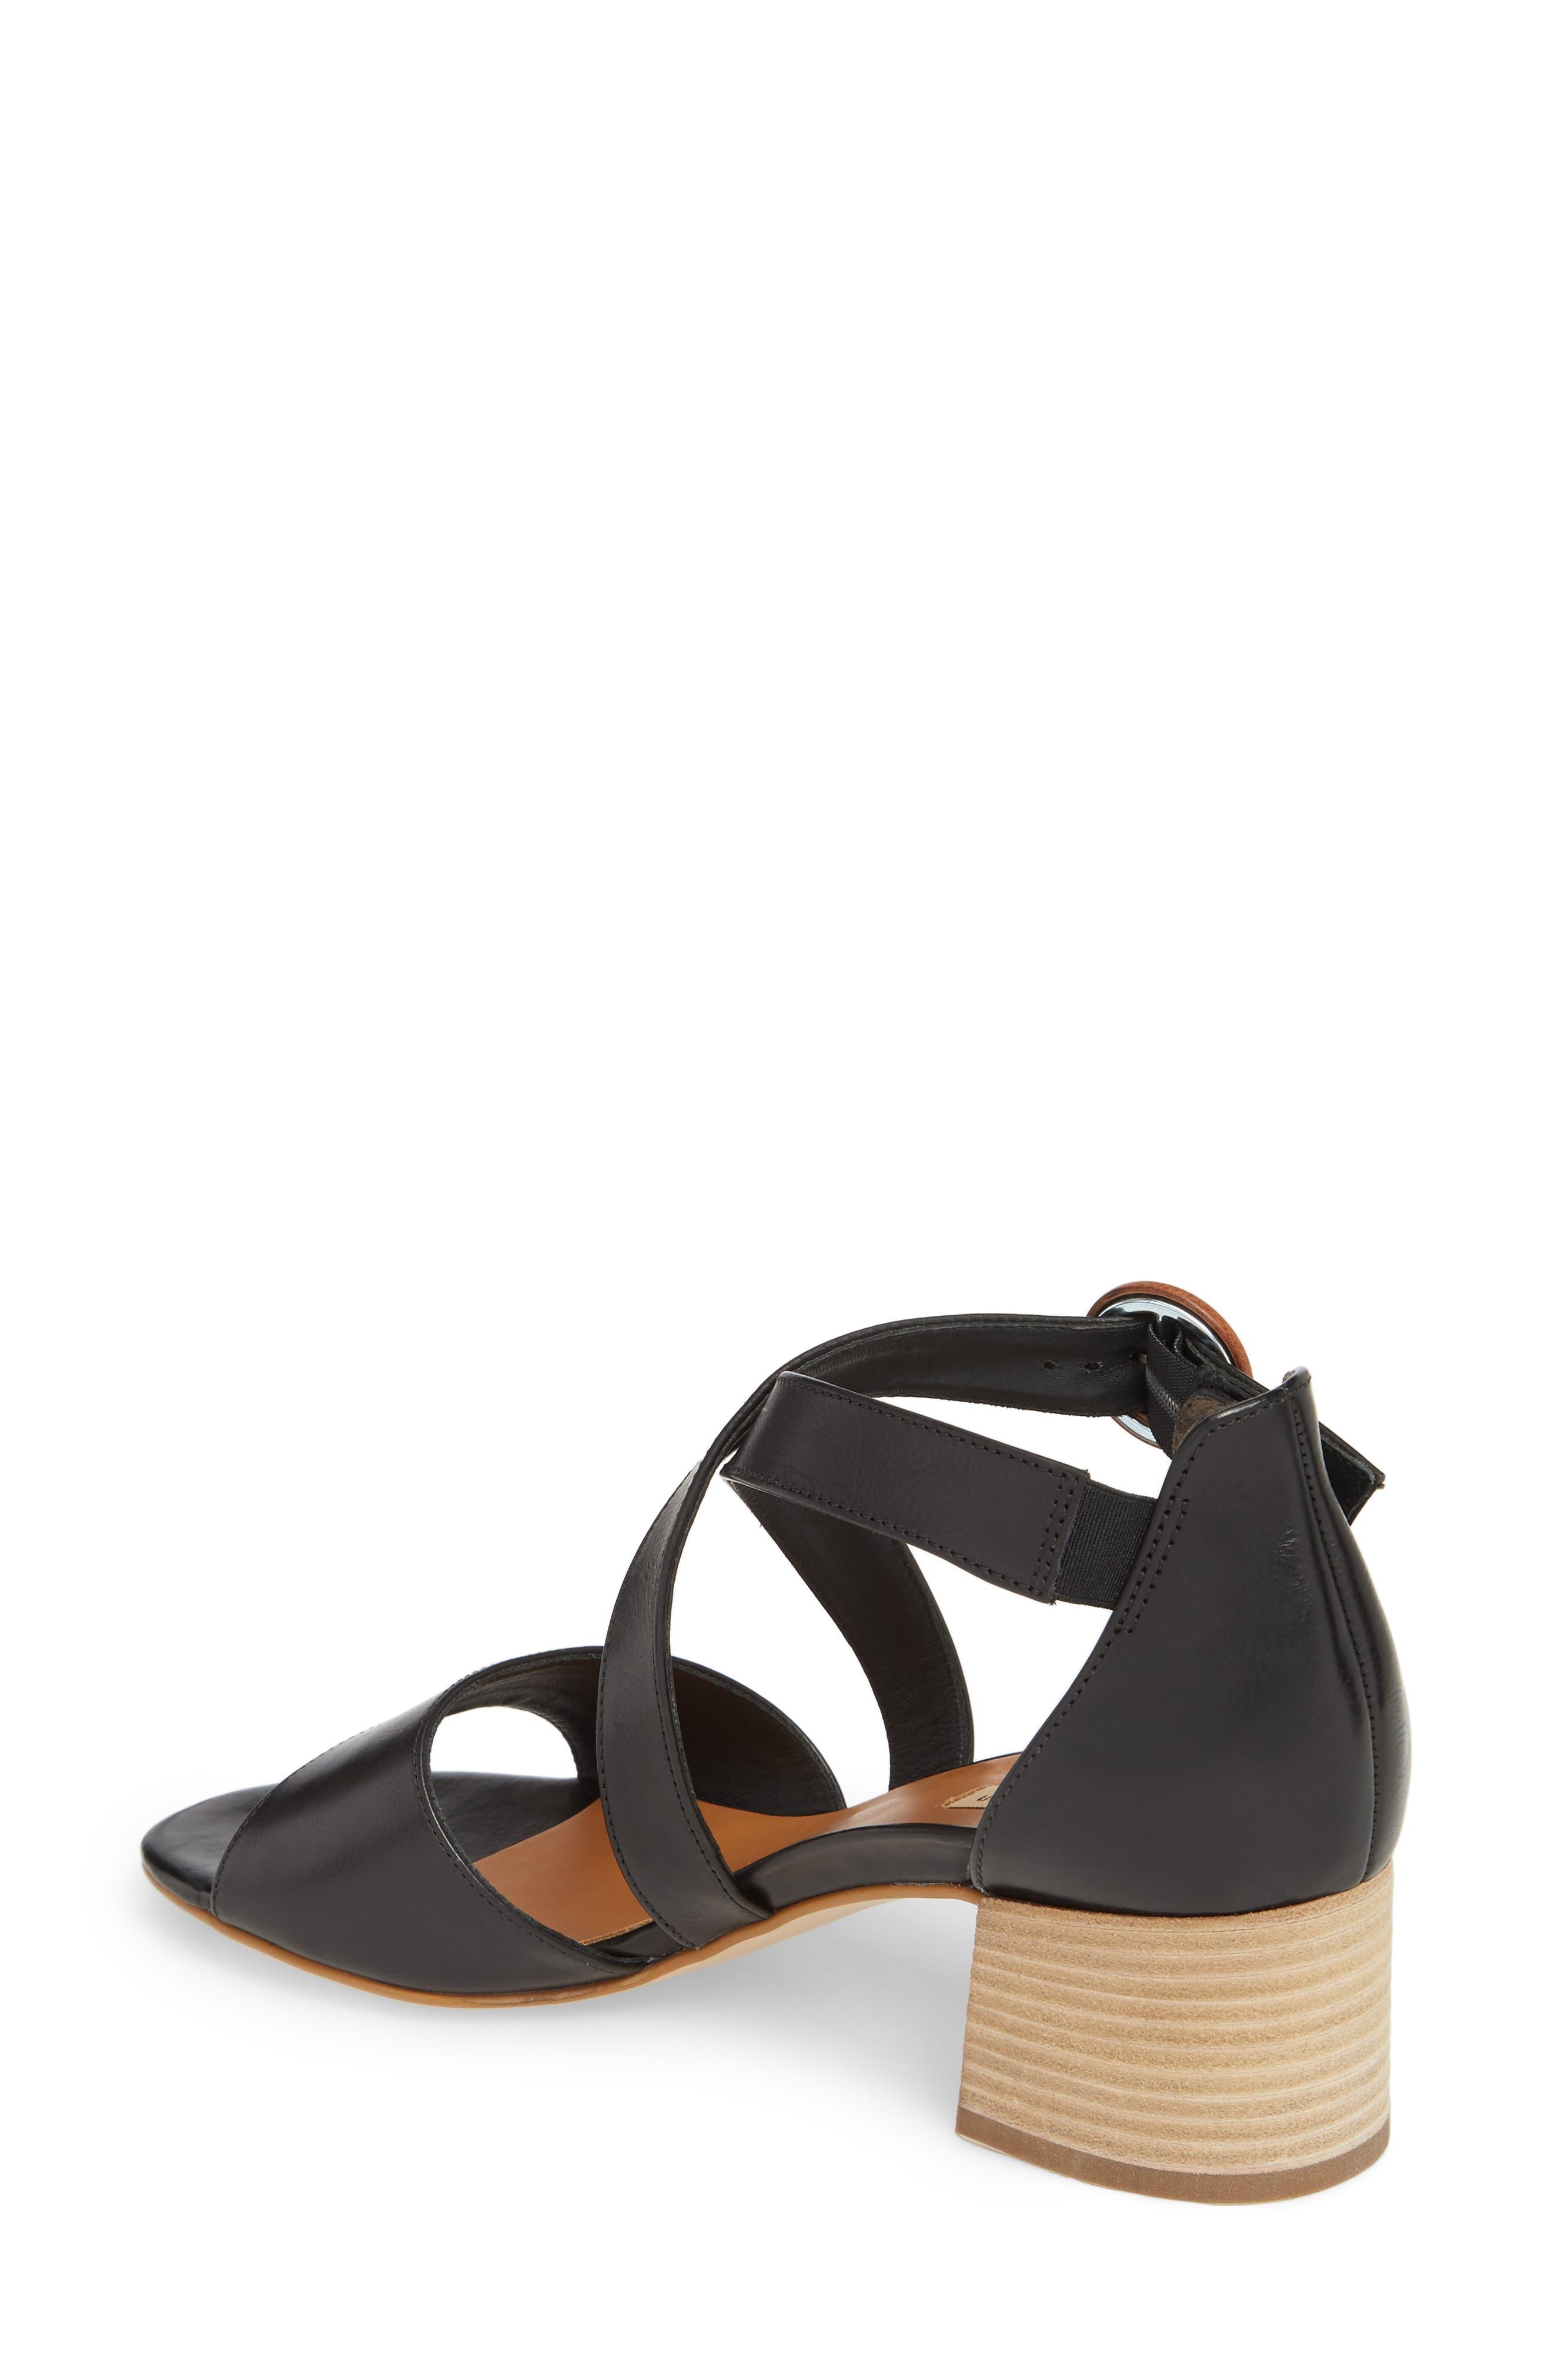 Sally Quarter Strap Sandal,                             Alternate thumbnail 2, color,                             Black Leather